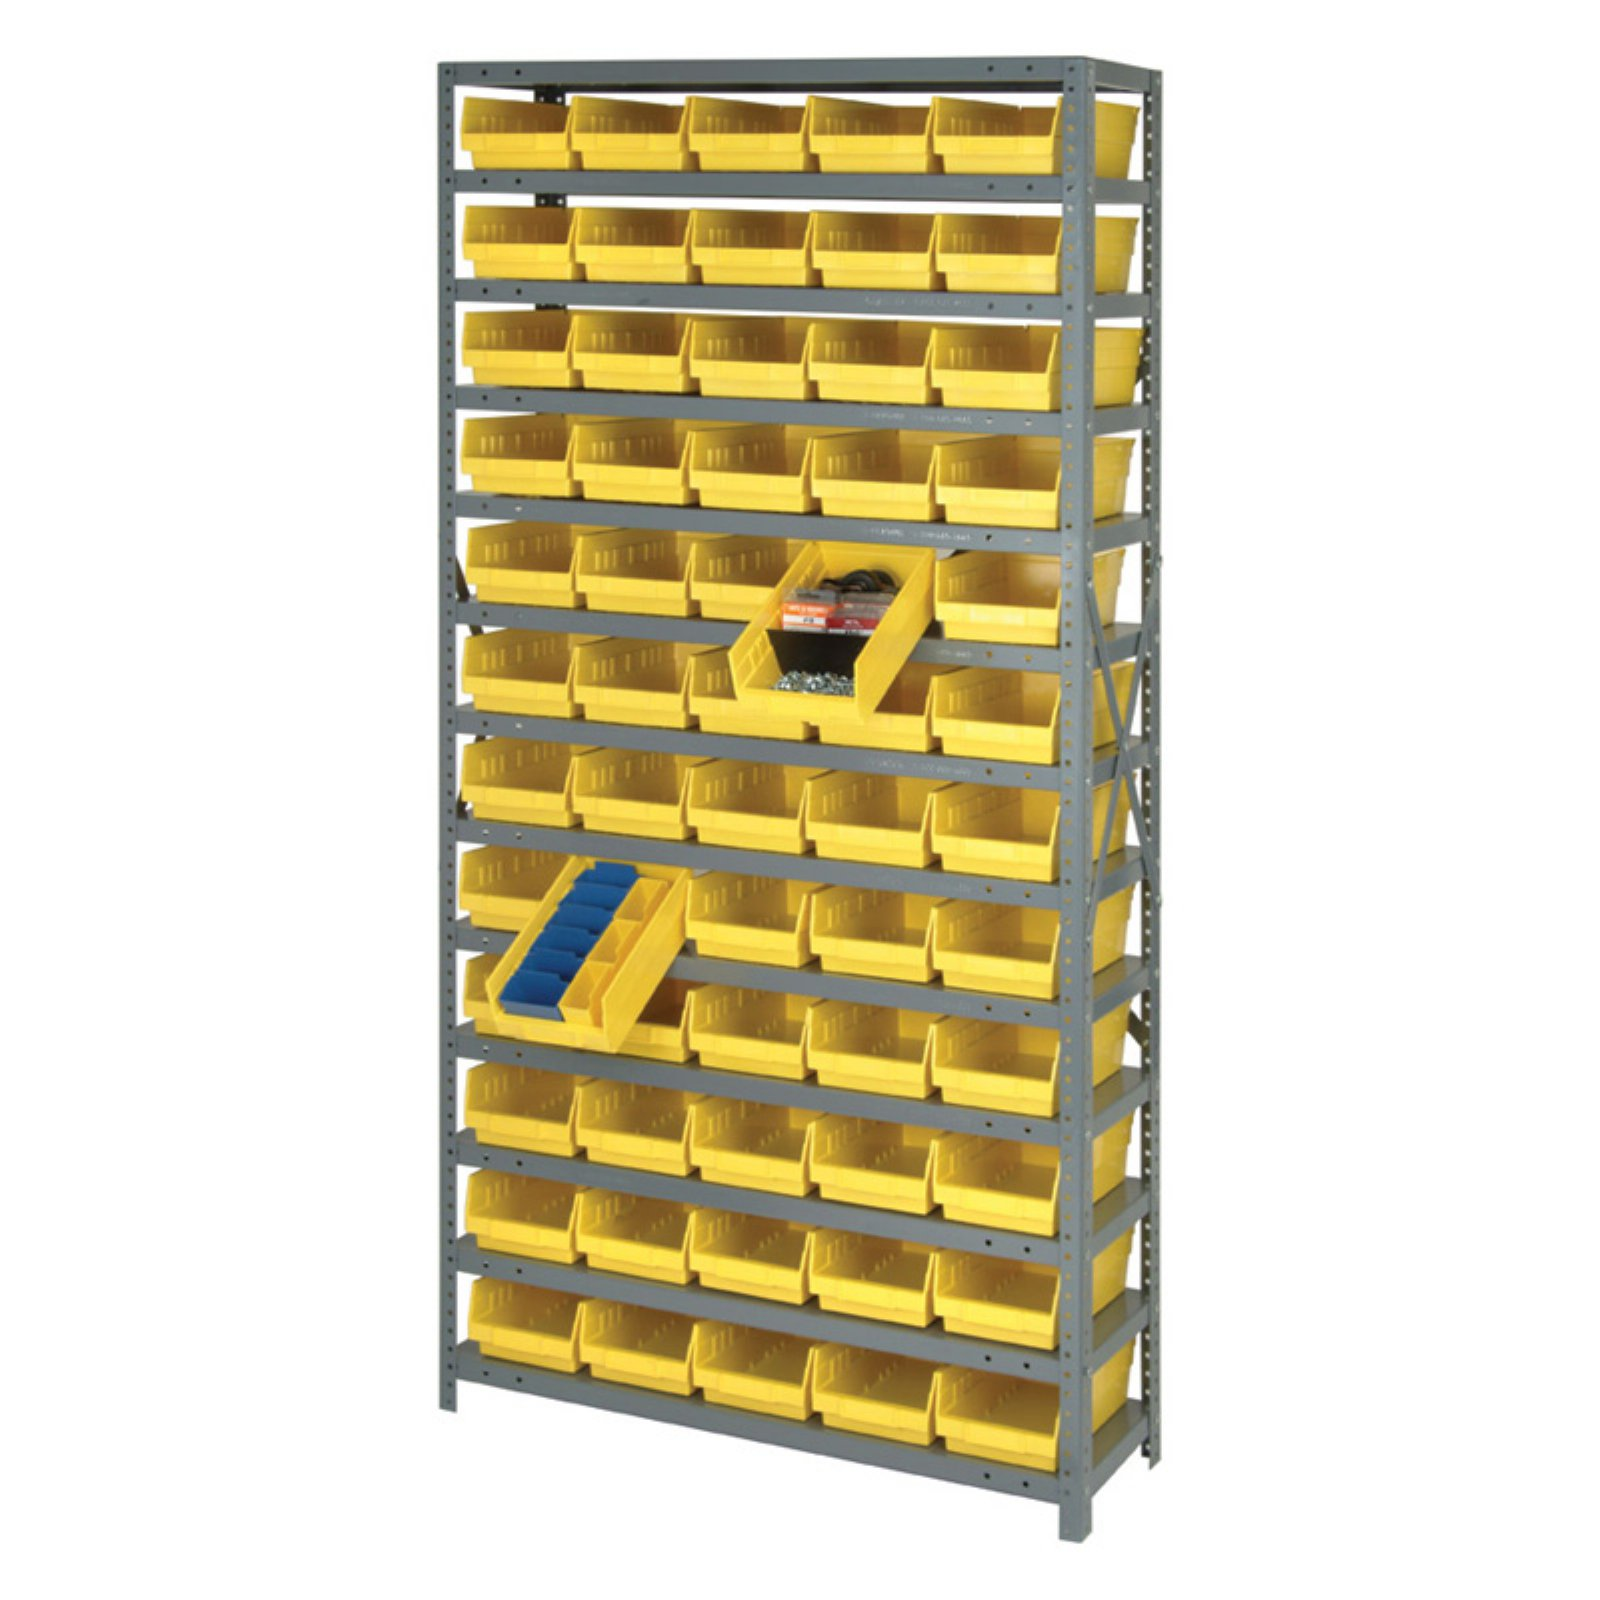 Quantum Complete Shelf Bin Storage System 96 Bin by Quantum Storage Systems